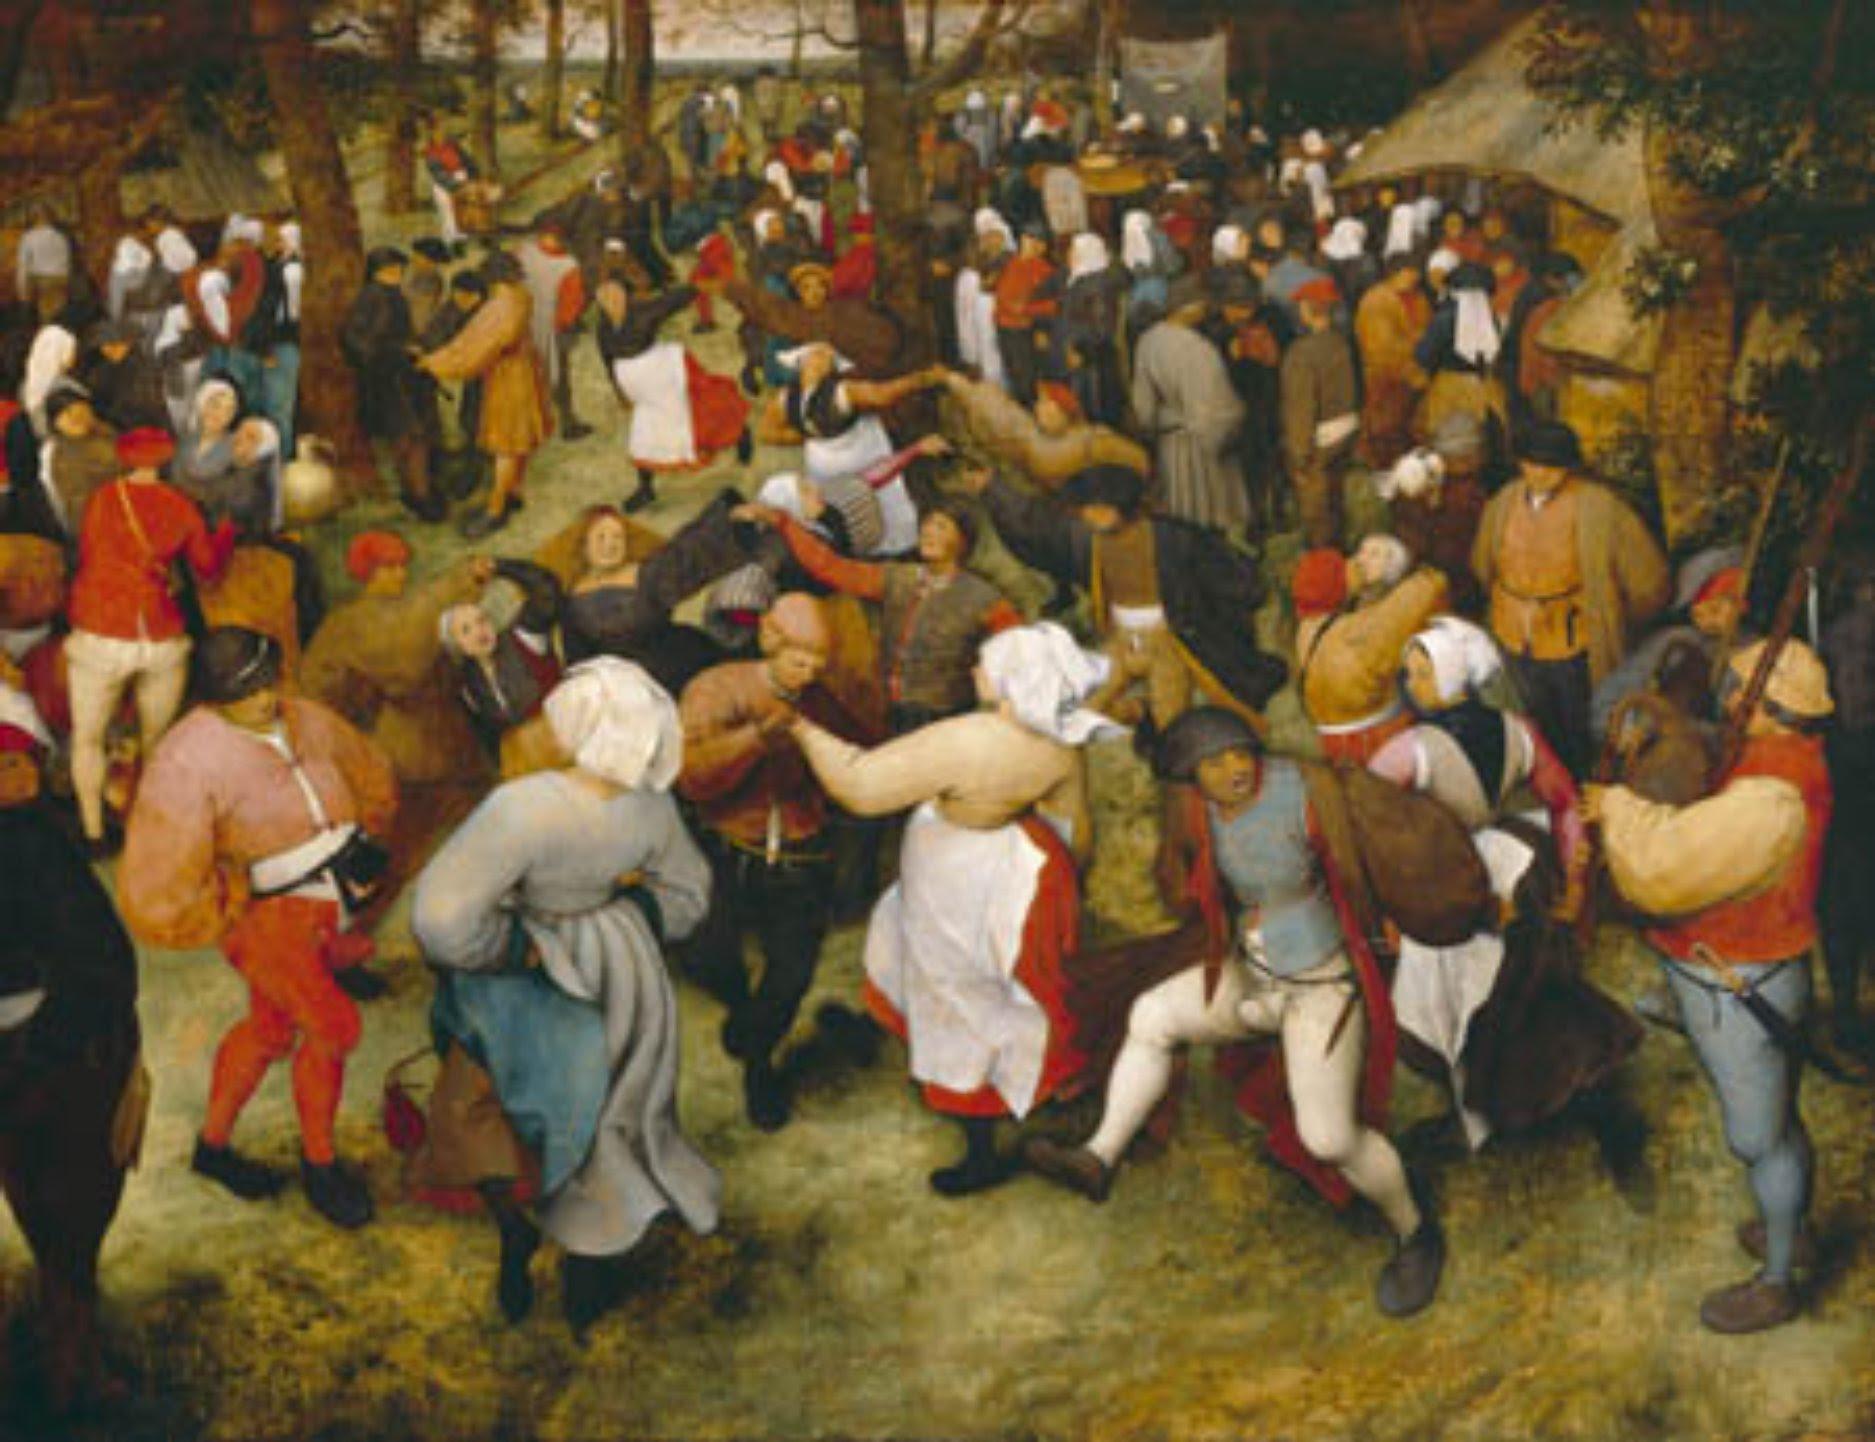 http://www.dancewith.co.uk/history/pieter-brueghel-wedding-dance.jpg